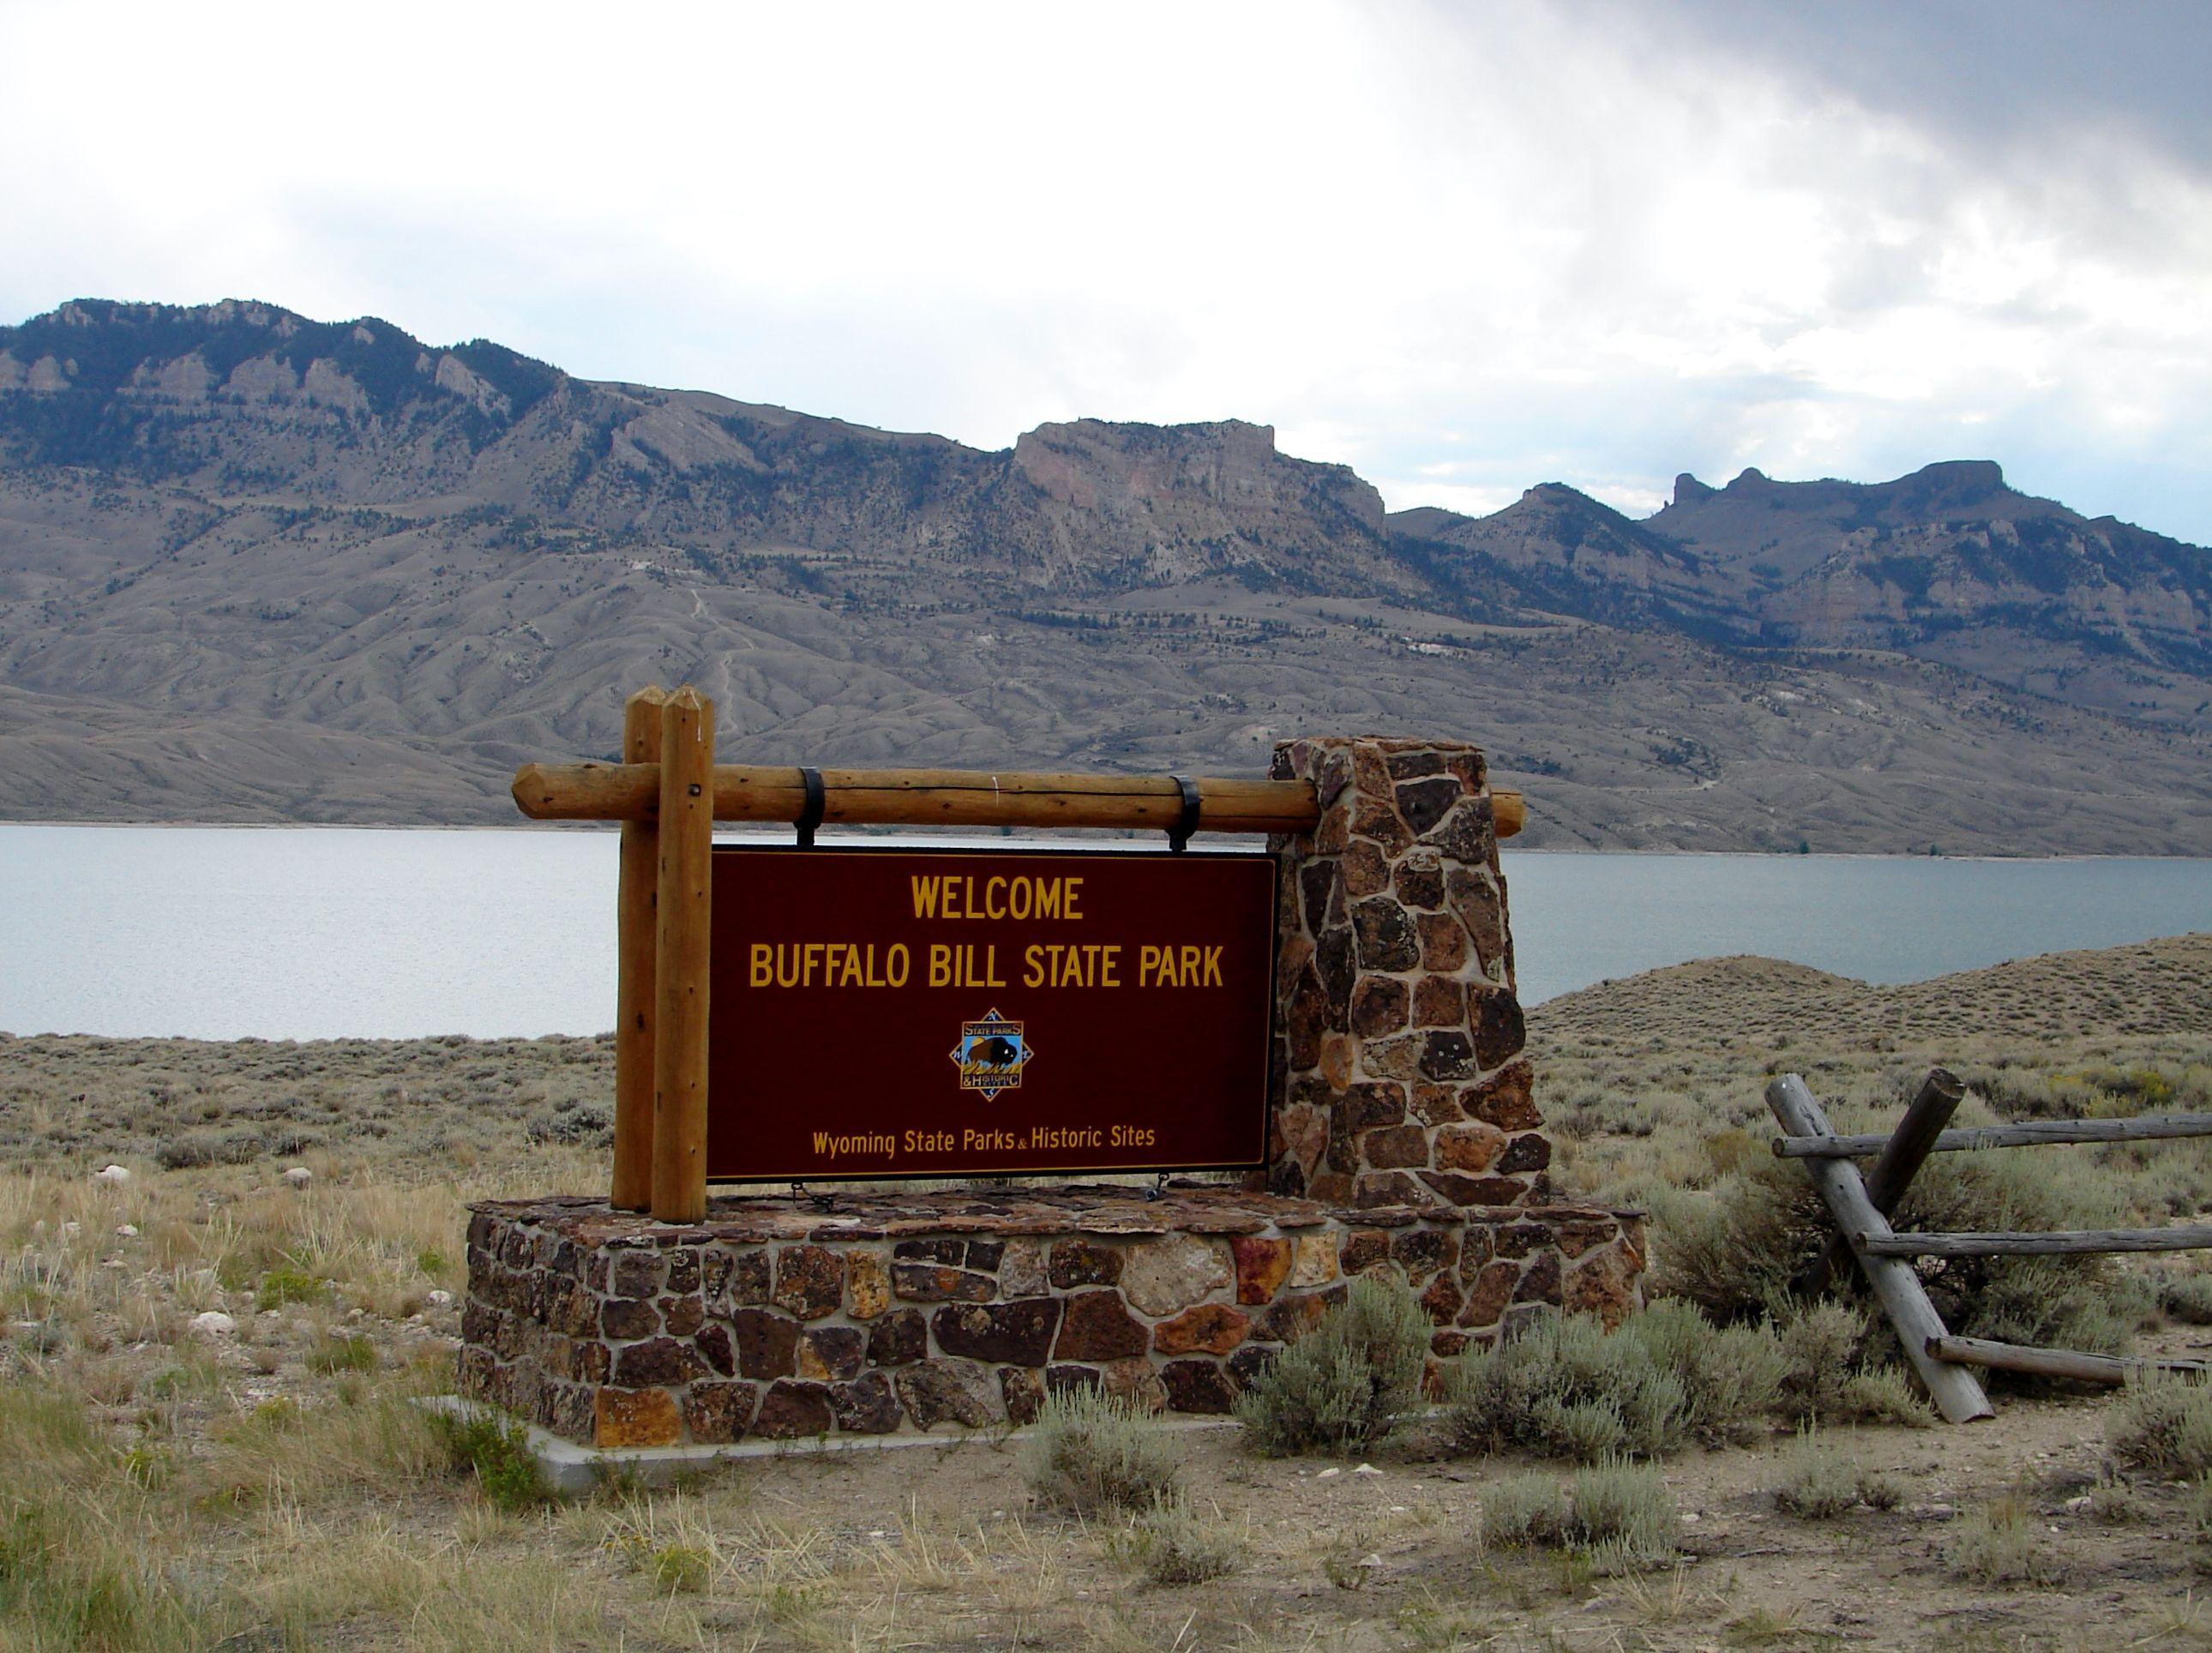 Buffalo Bill State Park Address Office 47 Lakeside Road Phone 307 587 9 National Park Vacation Yellowstone National Park Vacation Yellowstone National Park